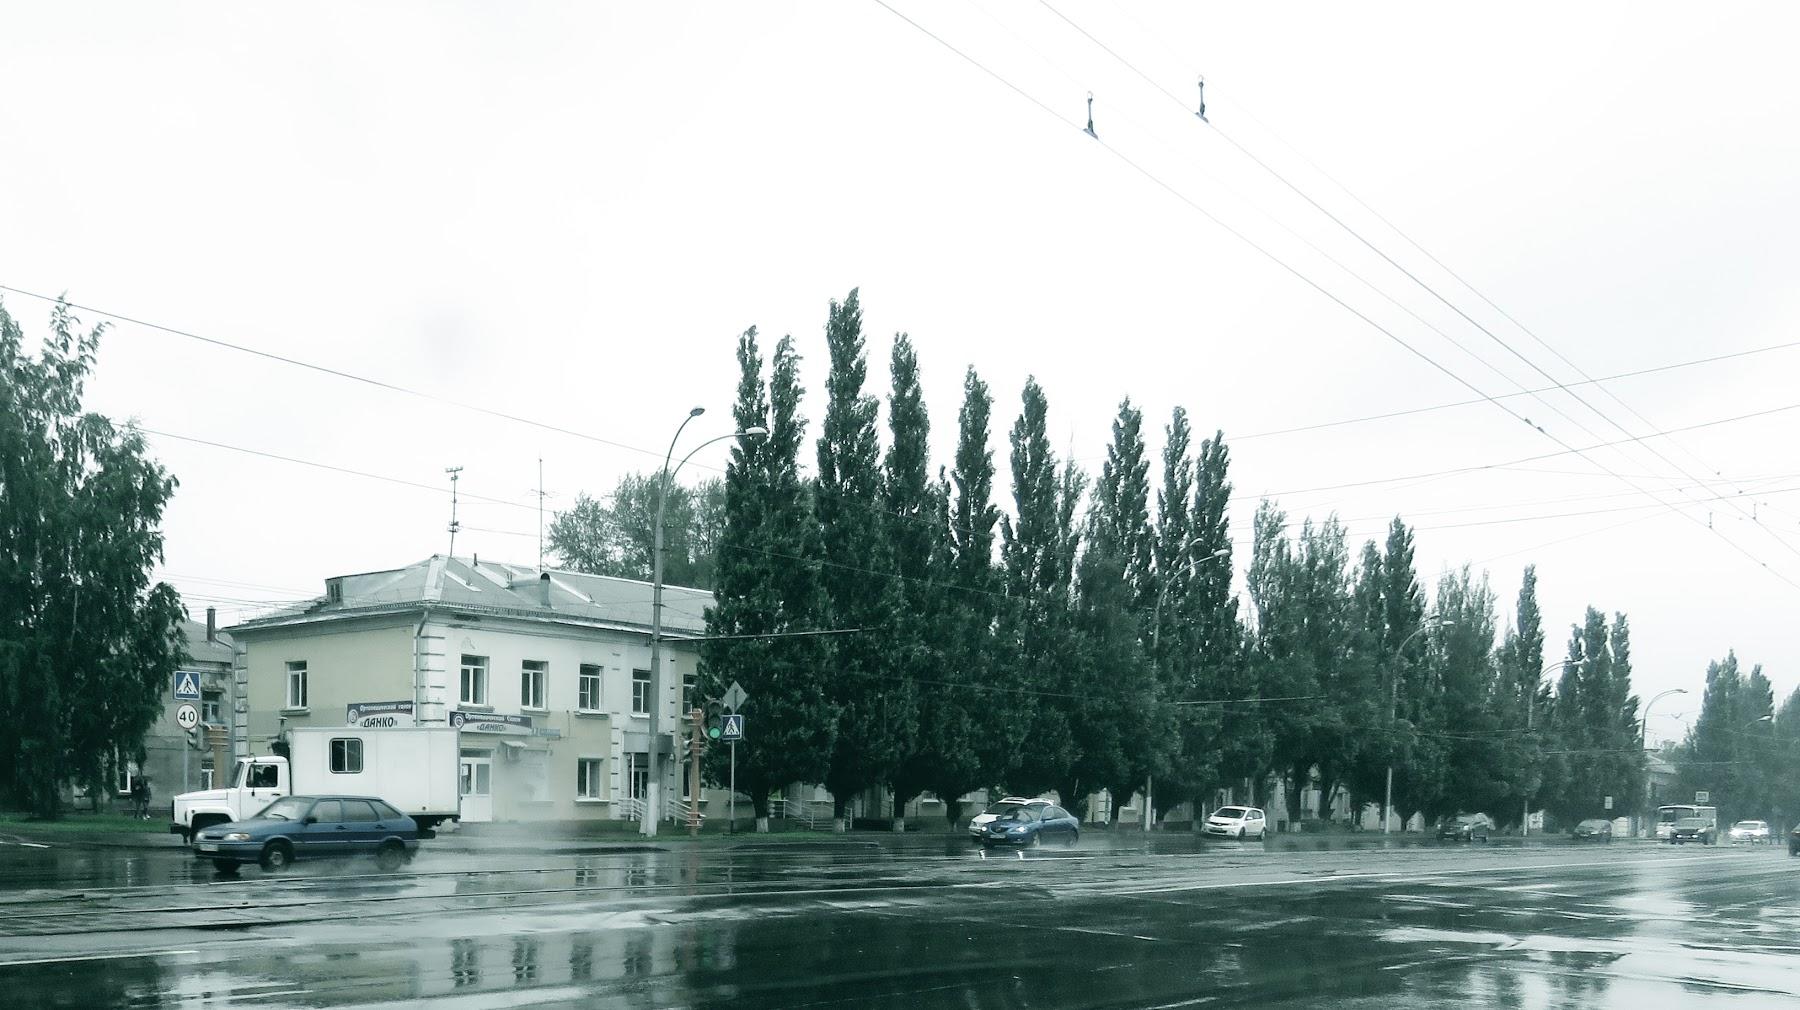 IMG_3163.jpg